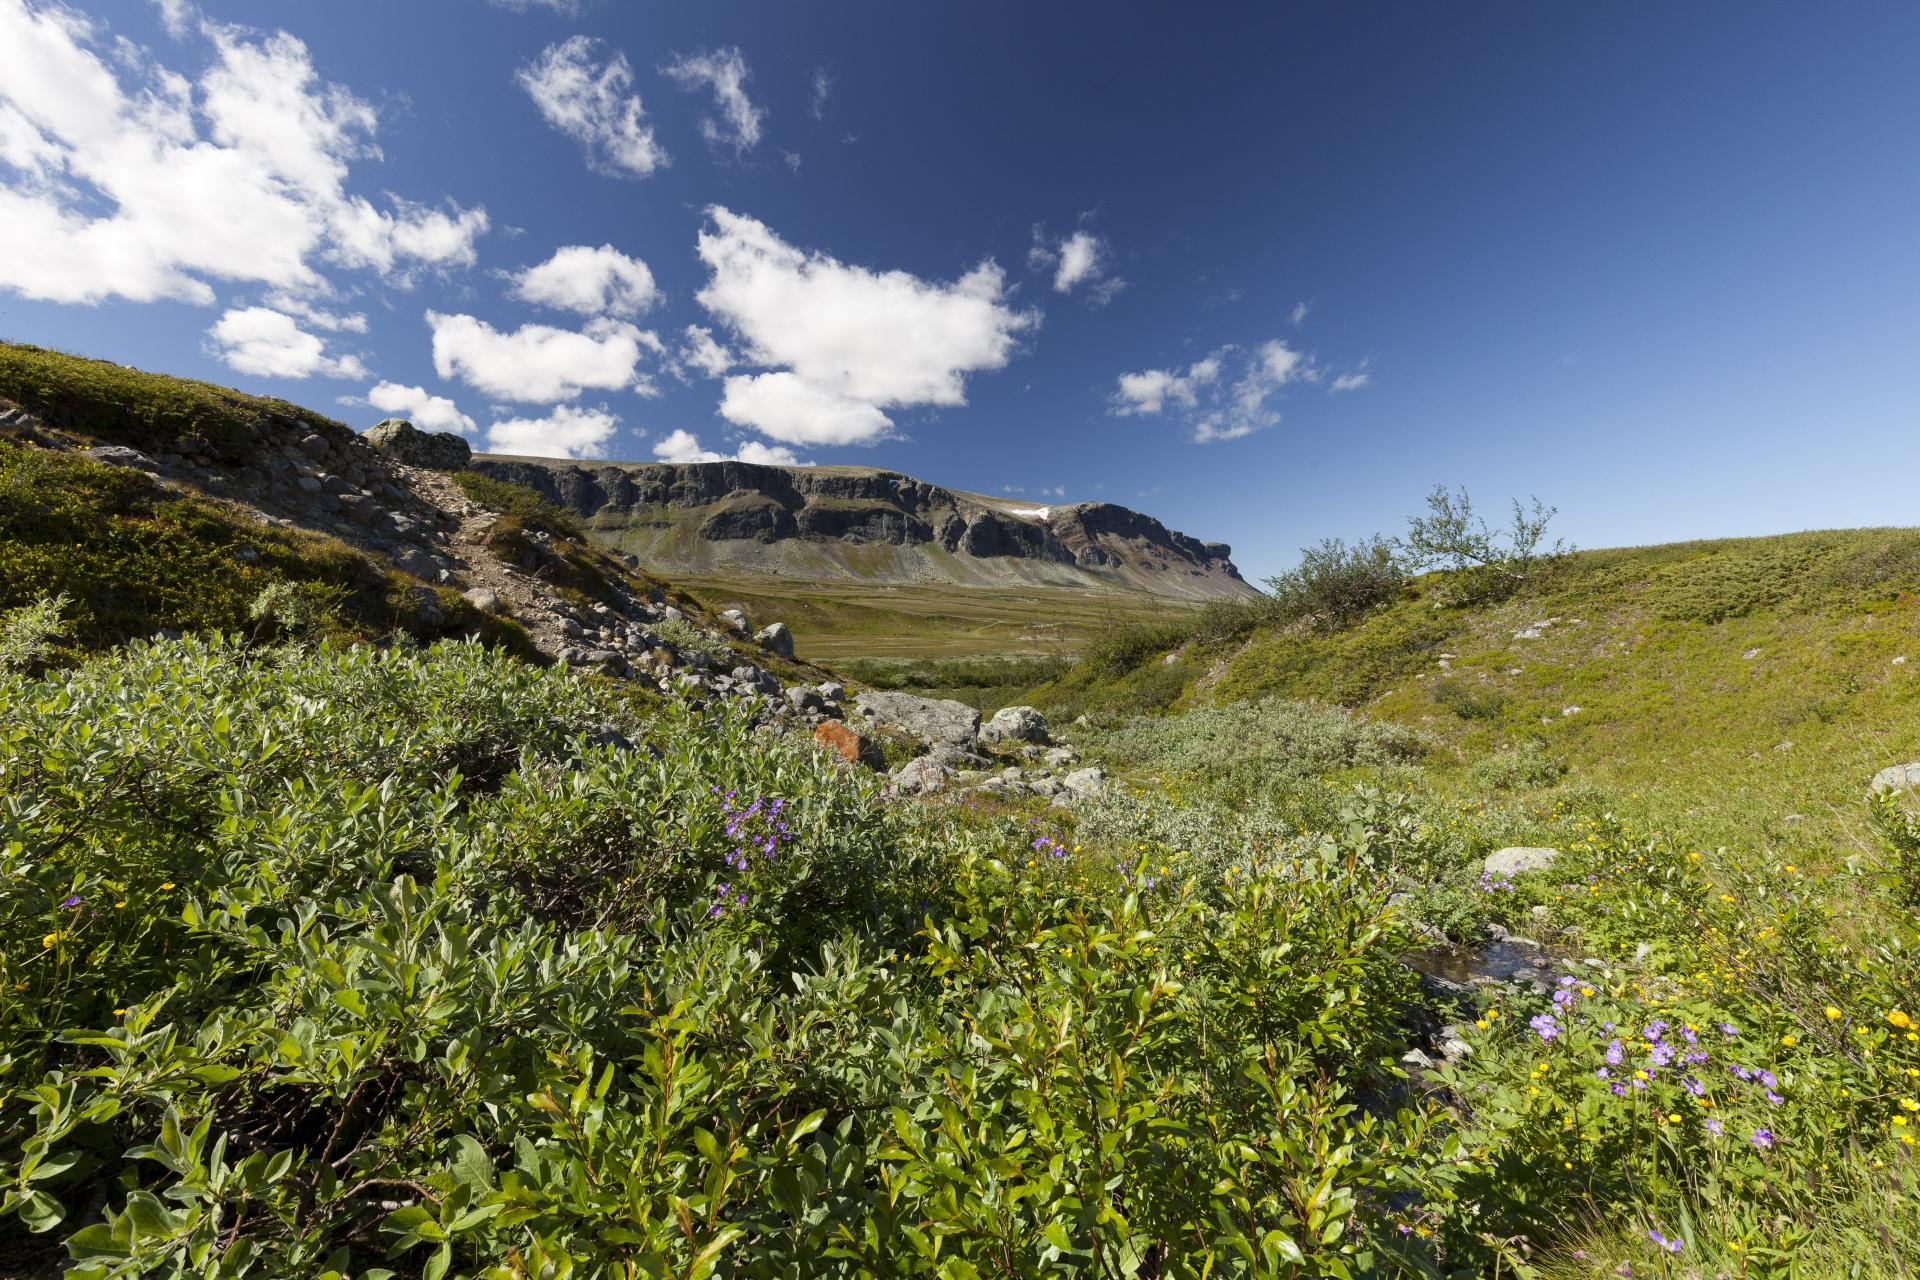 Reichhaltige Vegetation an geschützteren Plätzen